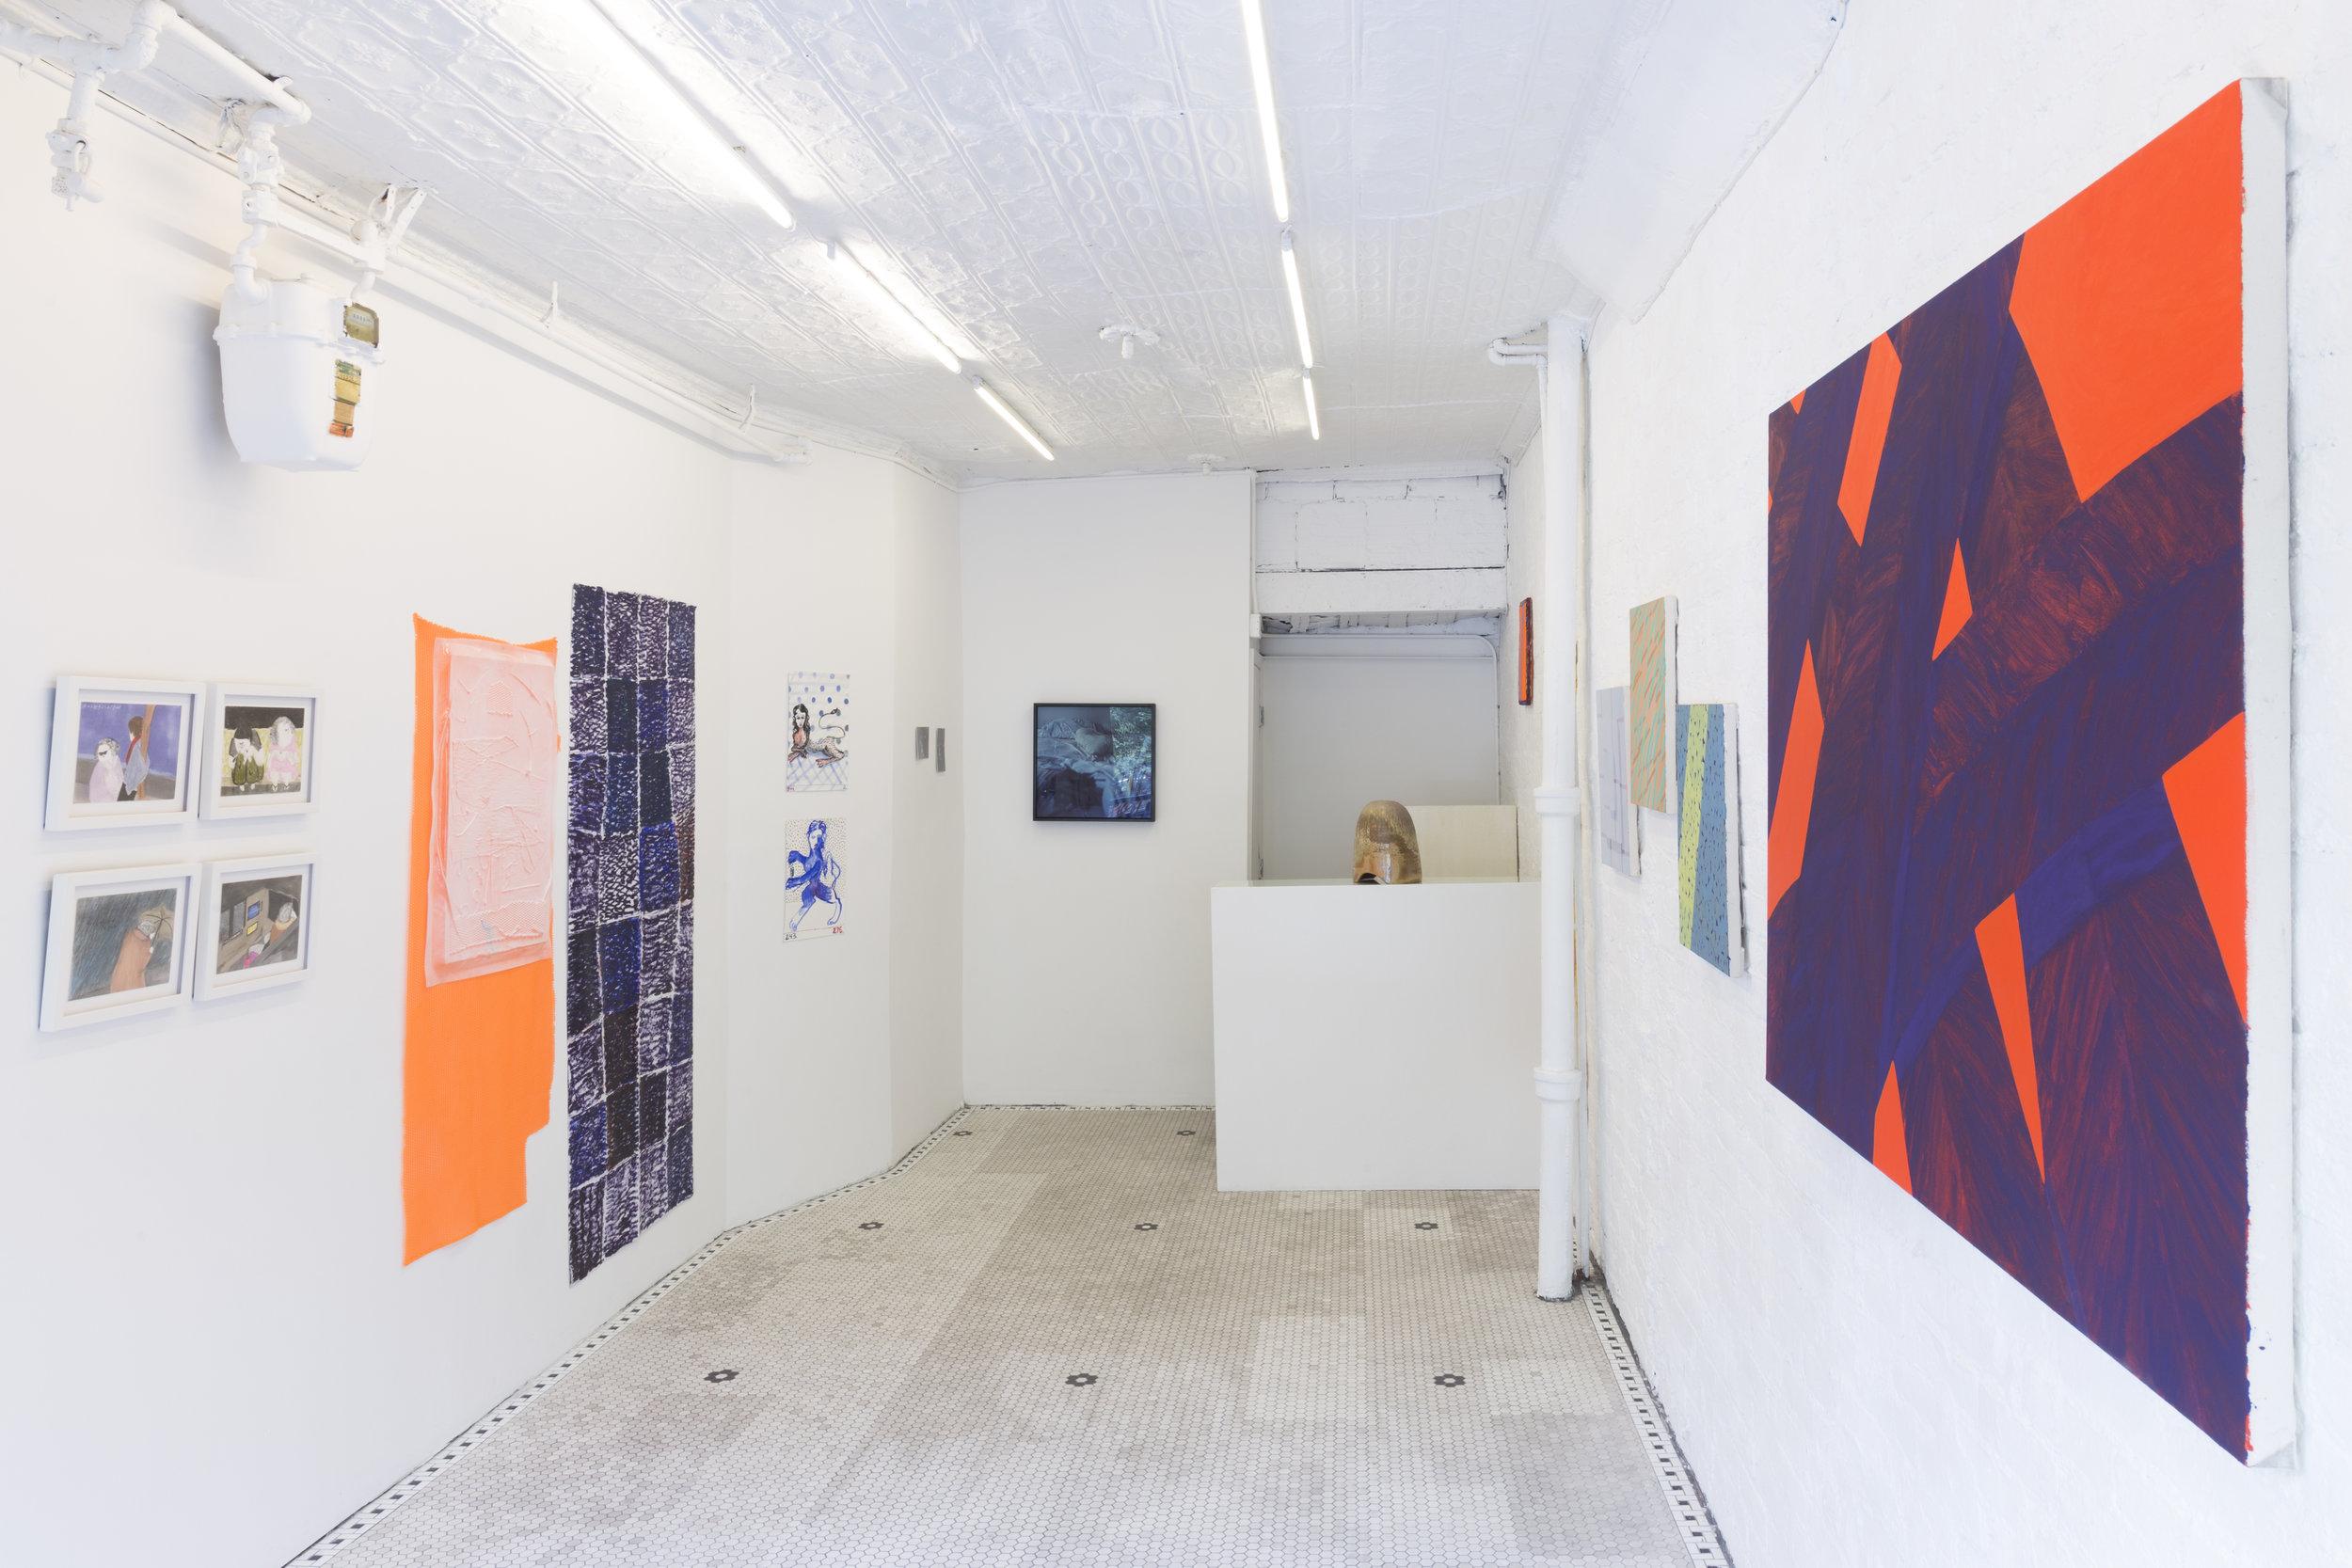 Installation view of First Year at 17 Essex in NYC, 2017. Photo credit: Kirsten Kilponen. Courtesy 17 Essex, New York